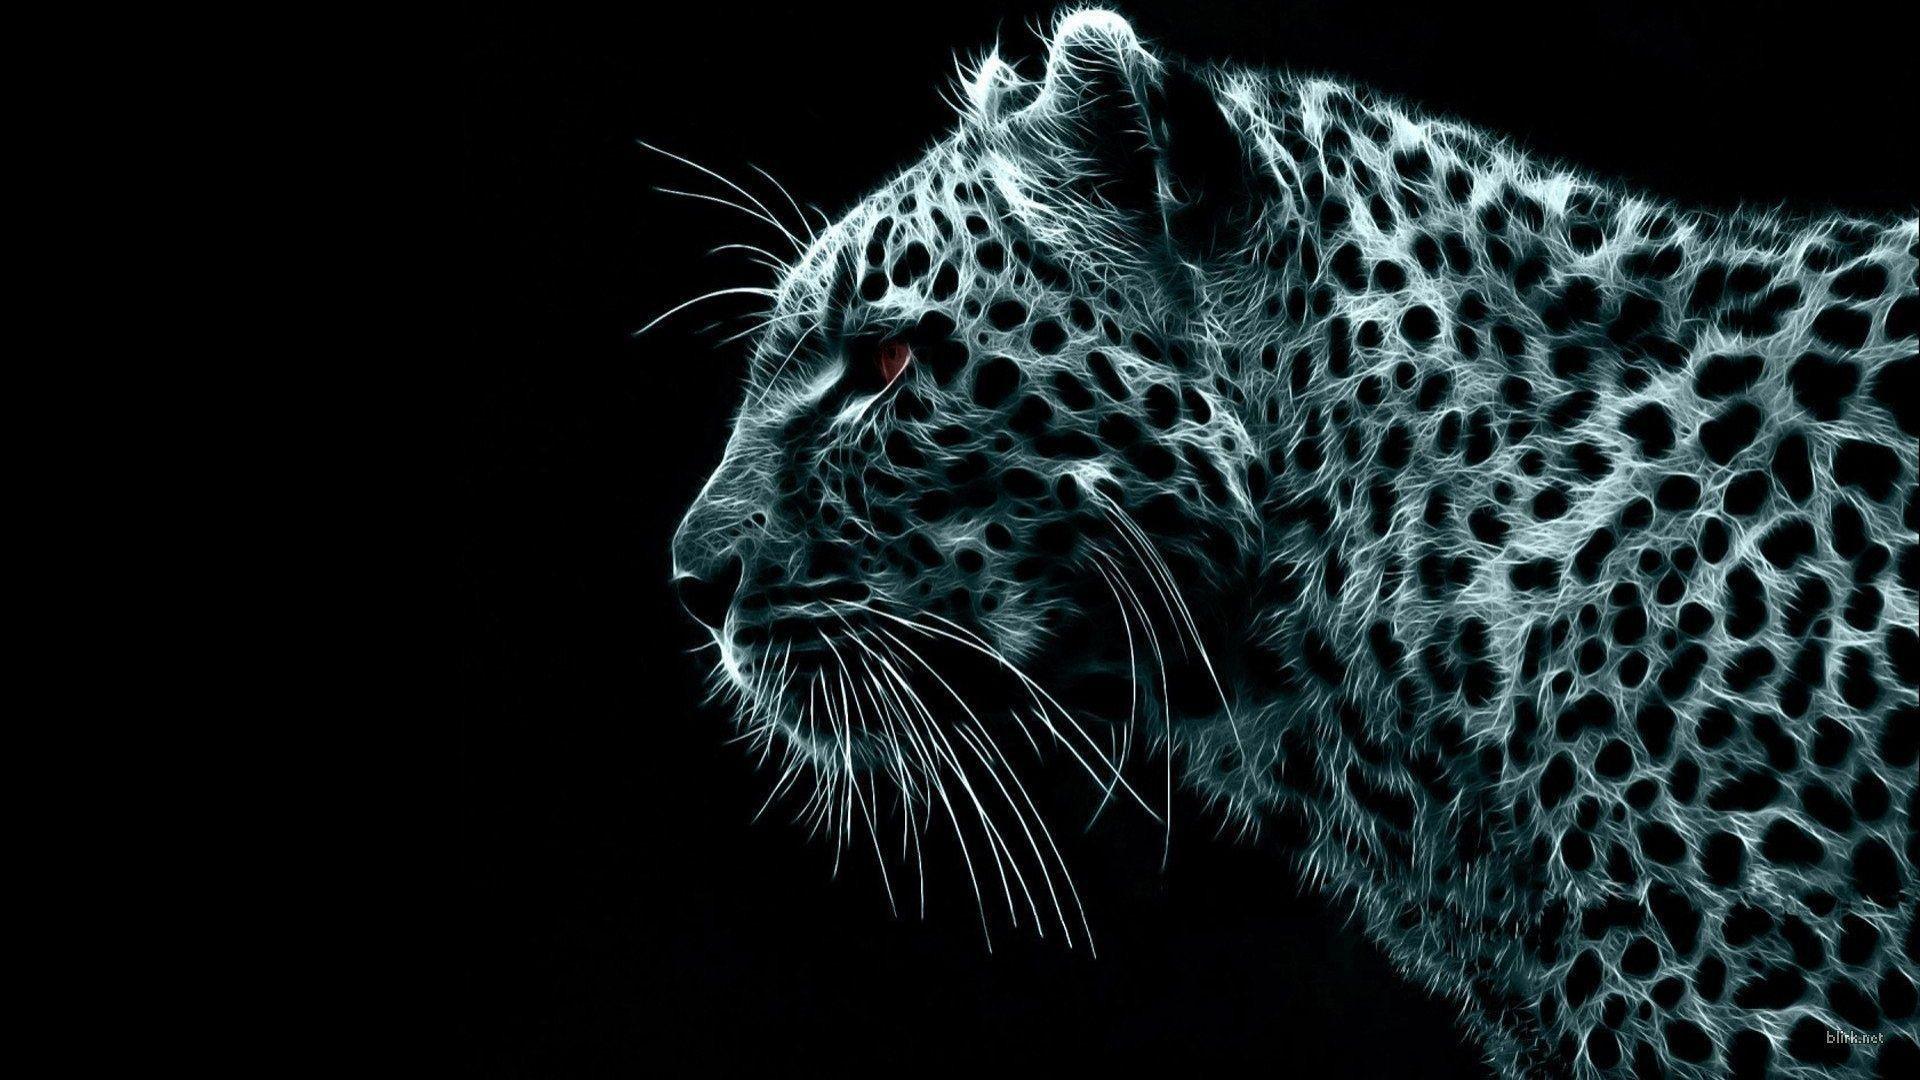 Snow_Leopard.jpg (1920×1080)